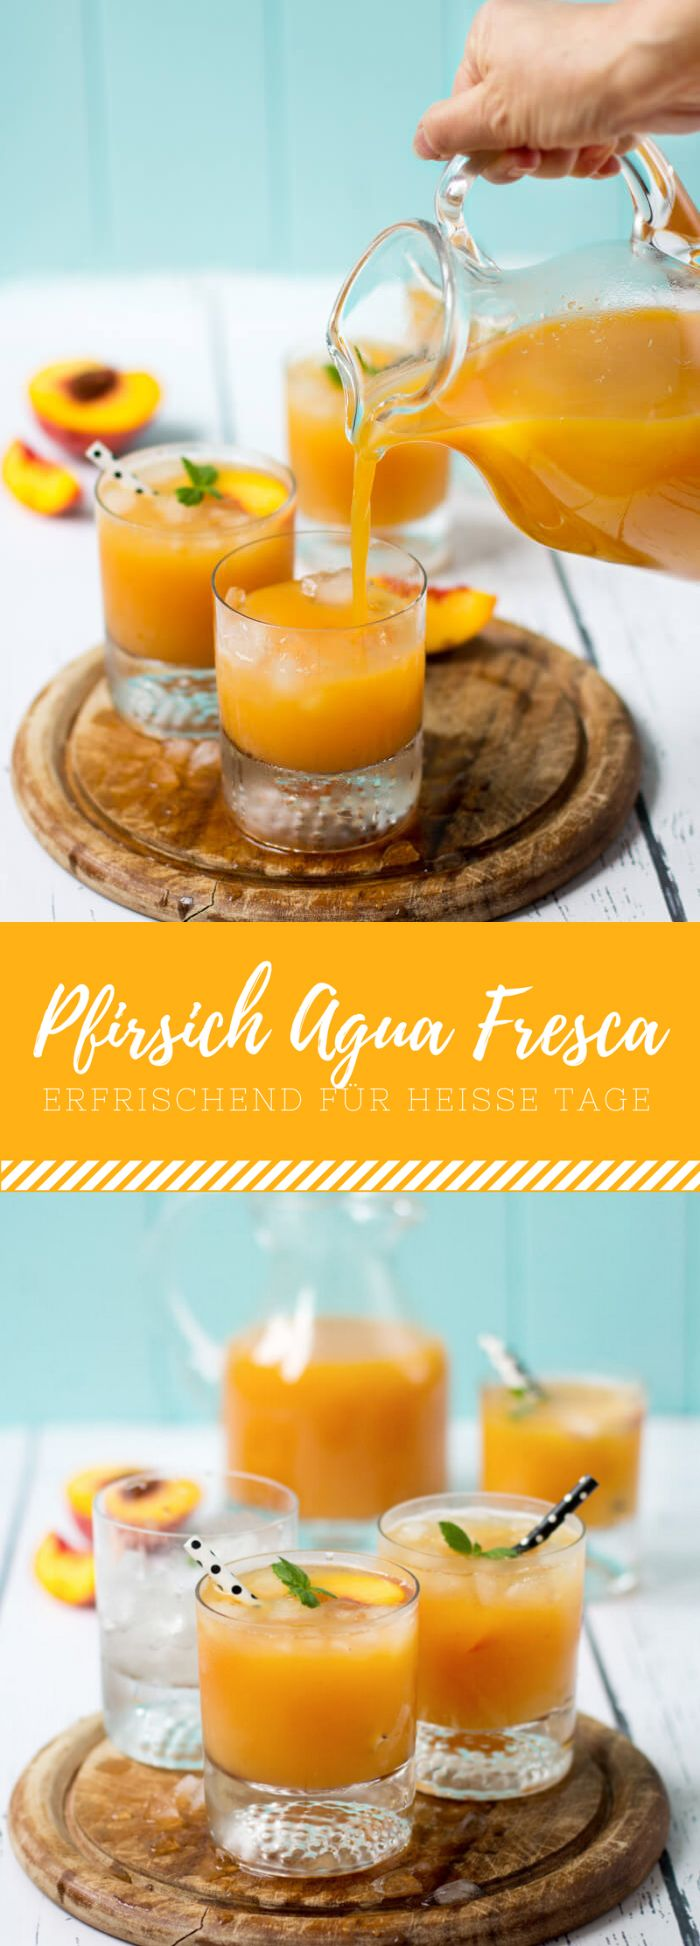 Pfirsich Agua Fresca   Rezept   Food and Drinks   Pinterest ...